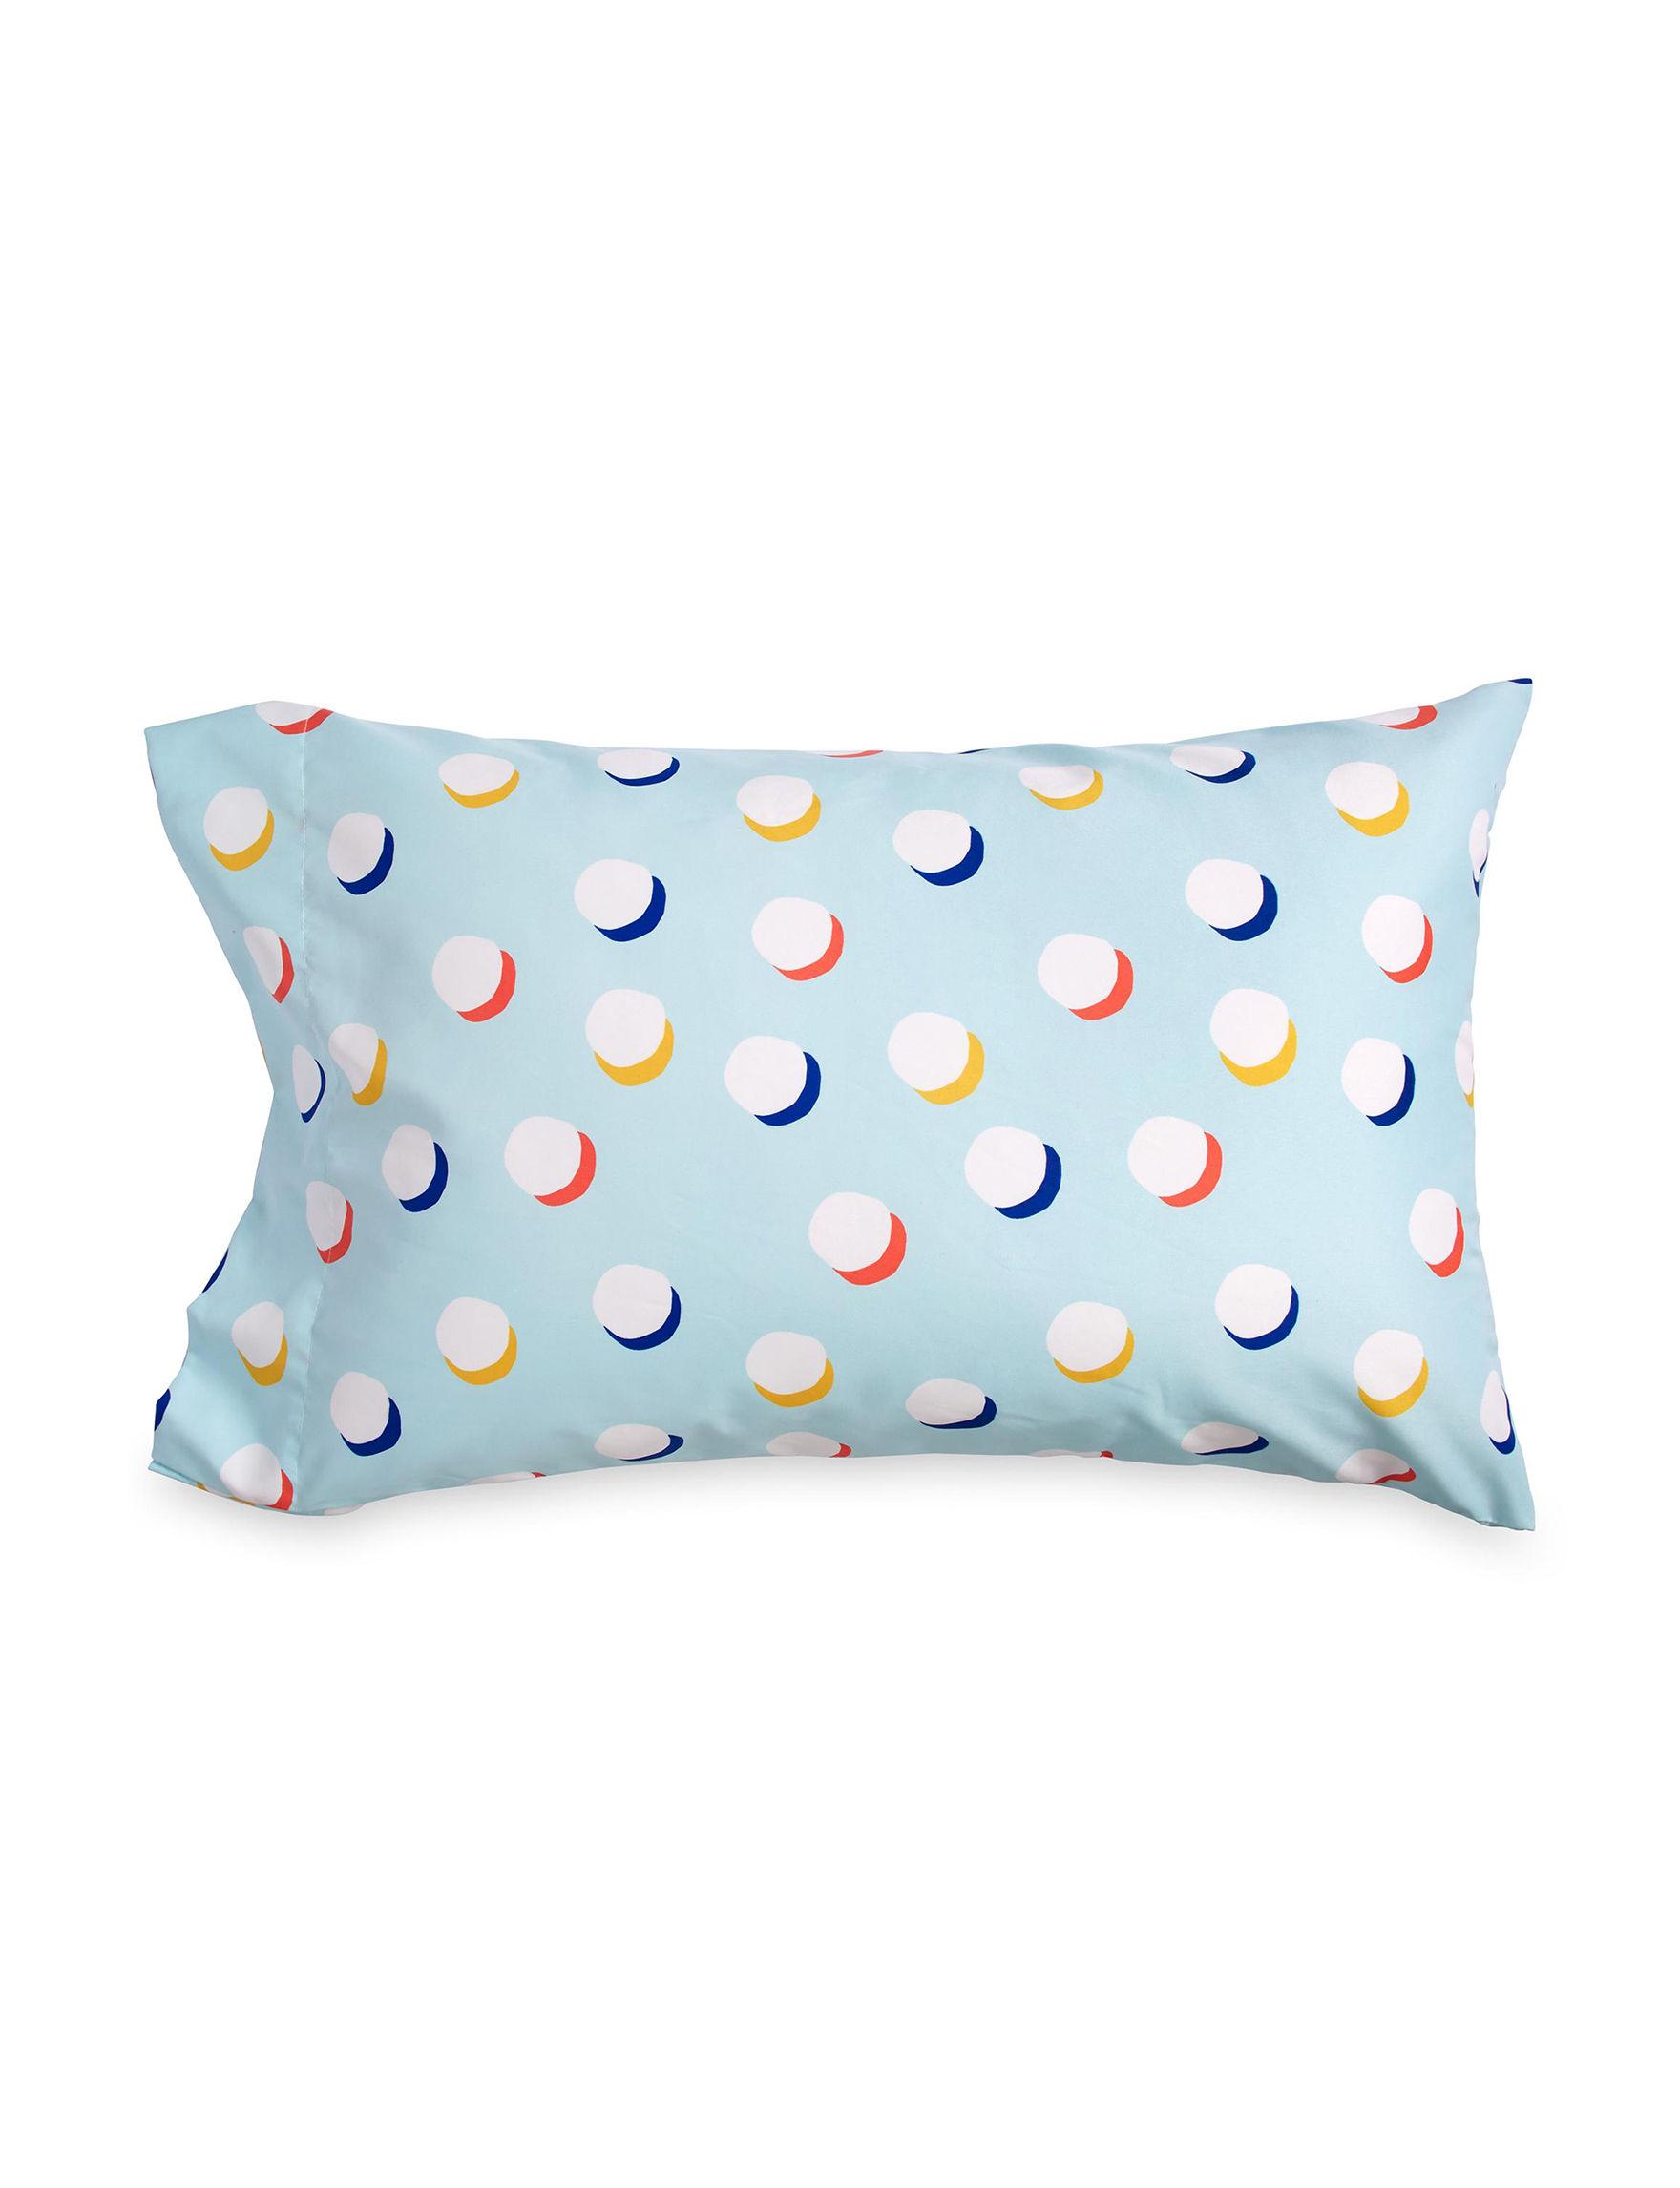 Scribble Aqua Bed Pillows Decorative Pillows Sheets & Pillowcases